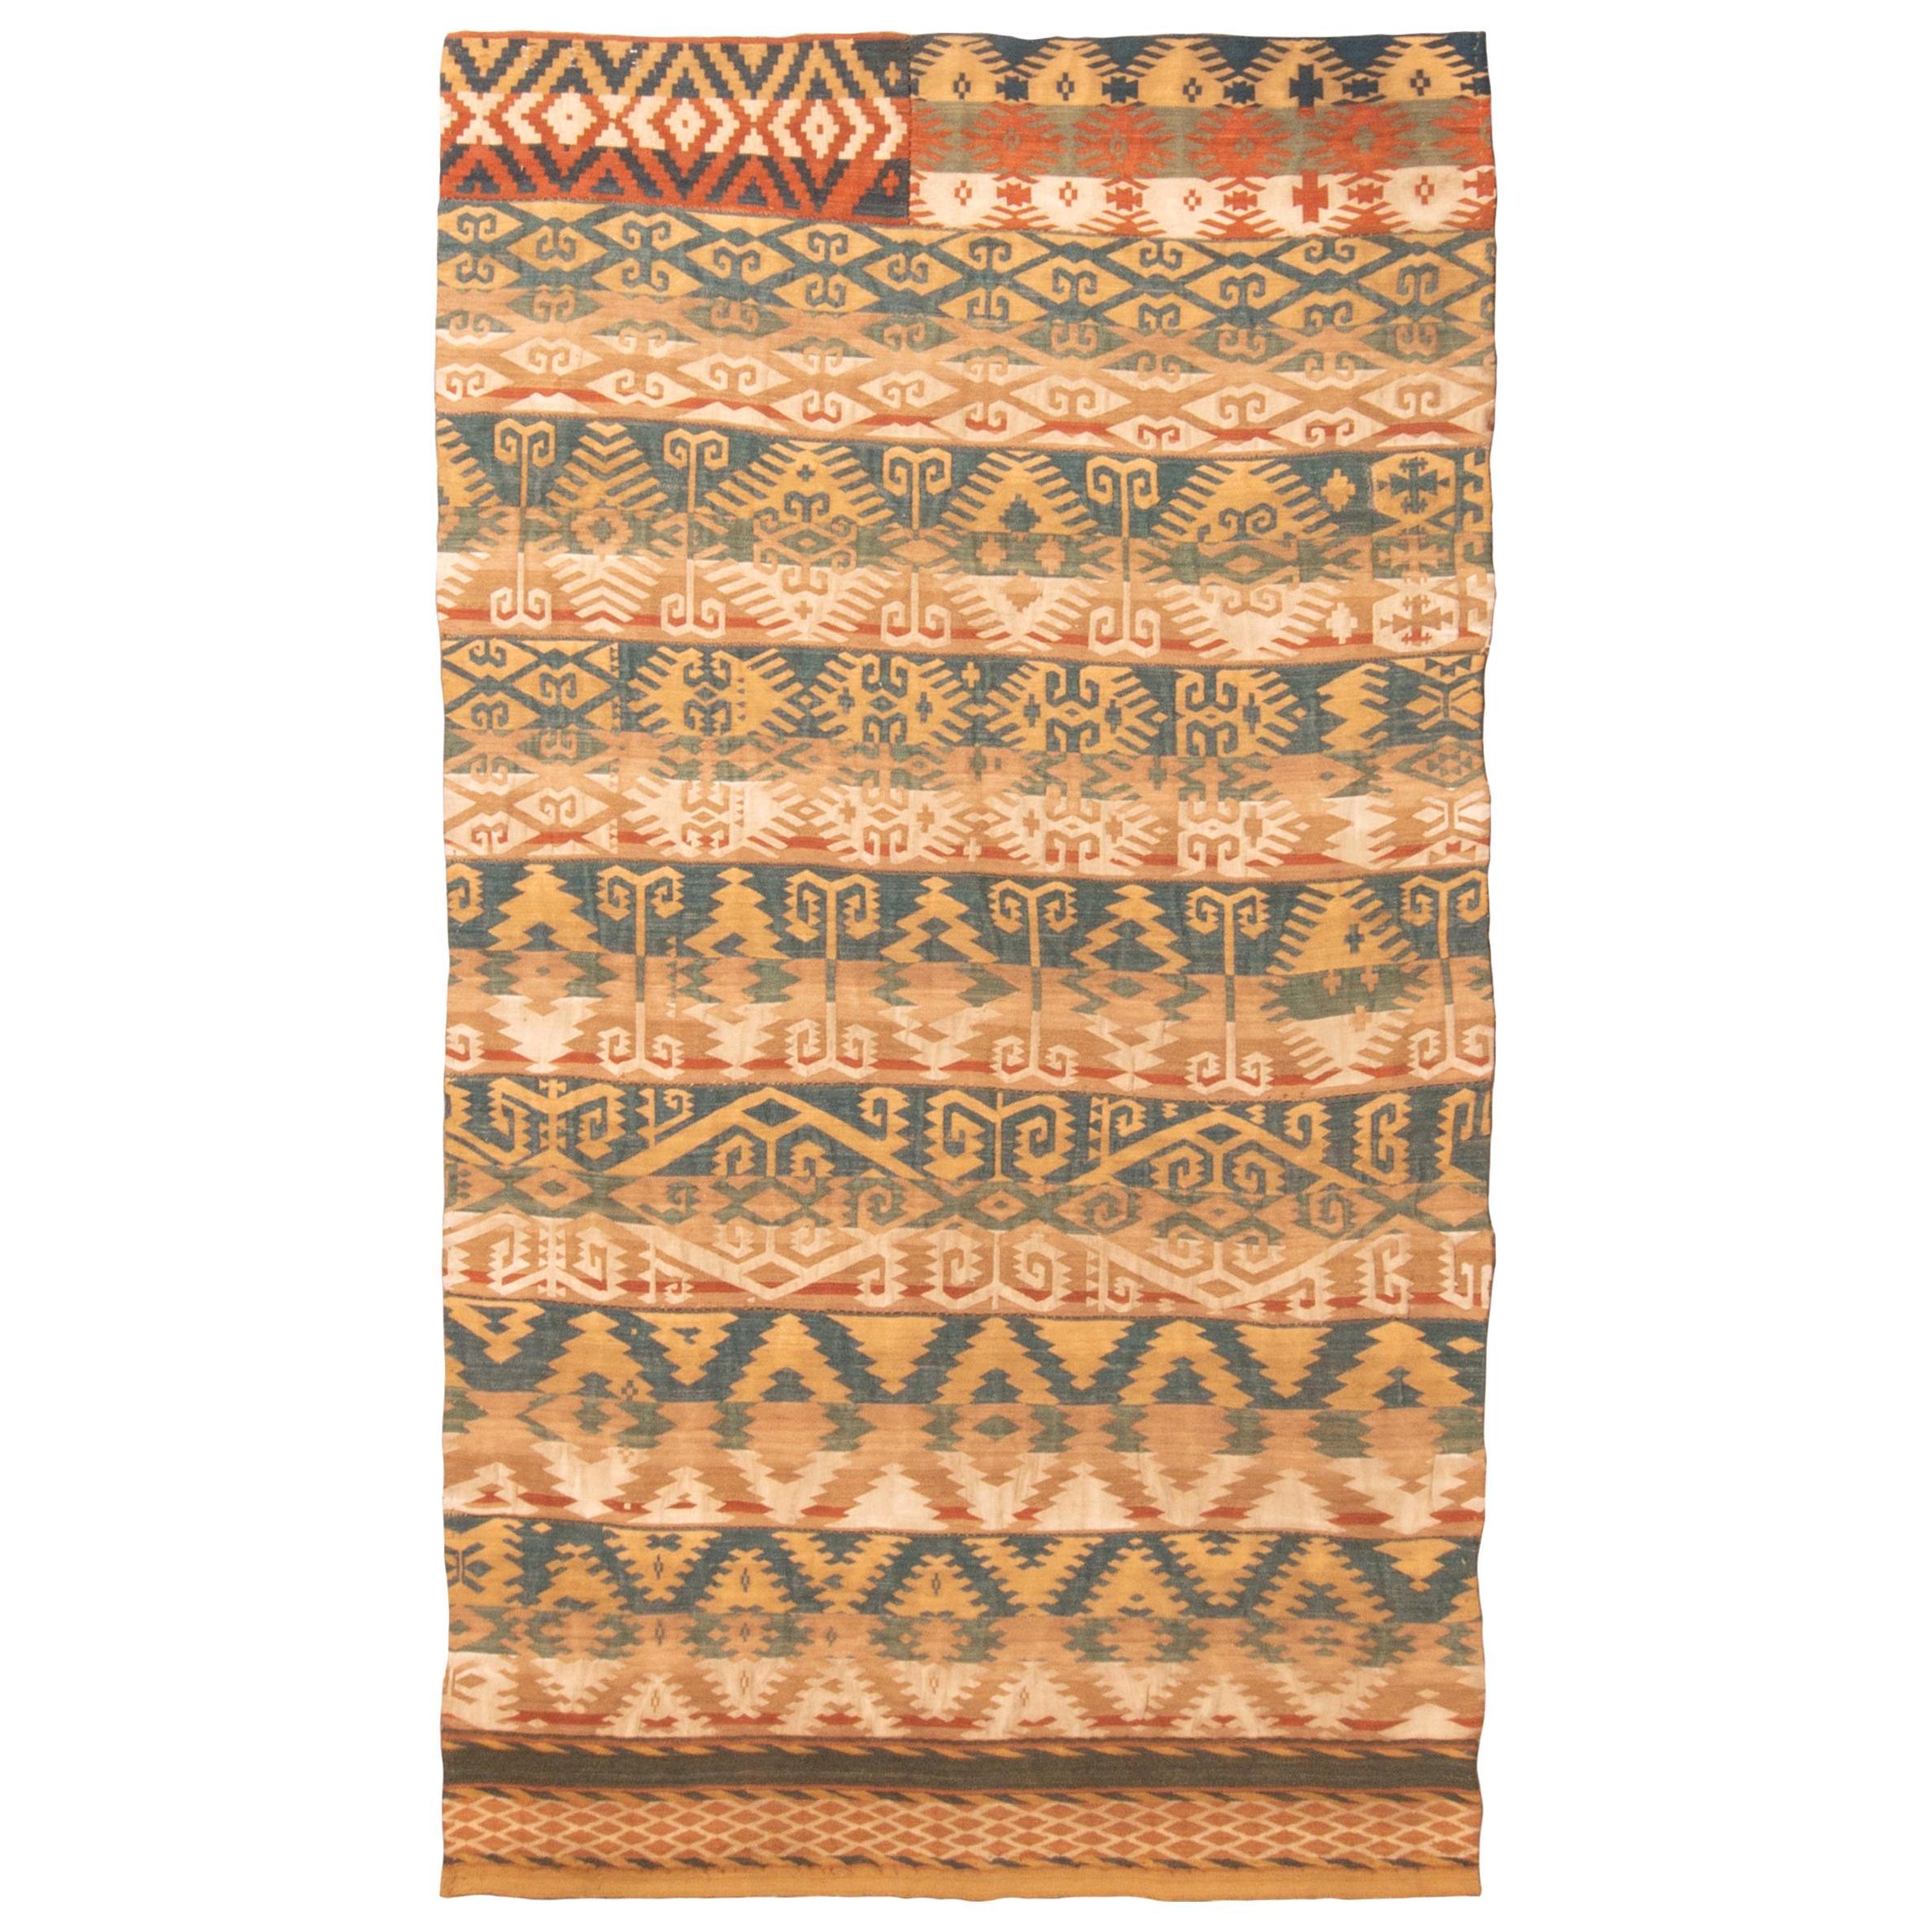 Antique Persian Jajim Beige and Blue Wool Rug Geometric Pattern